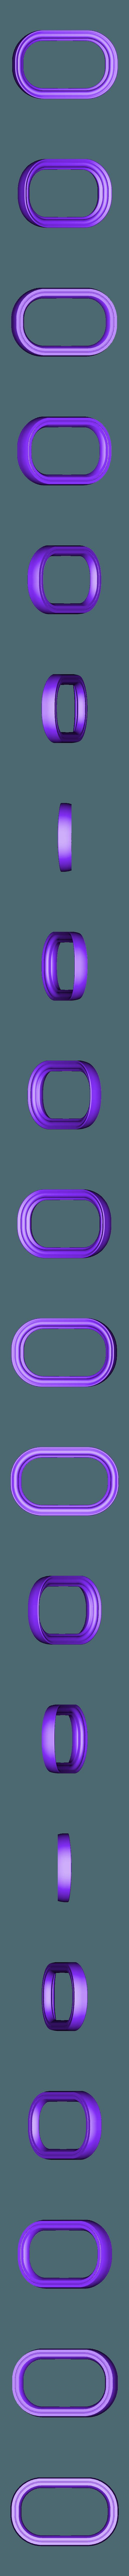 Spool_Tray_v1-3_NINJA.STL Download free STL file Filament Spool Holder • 3D printer template, WalterHsiao